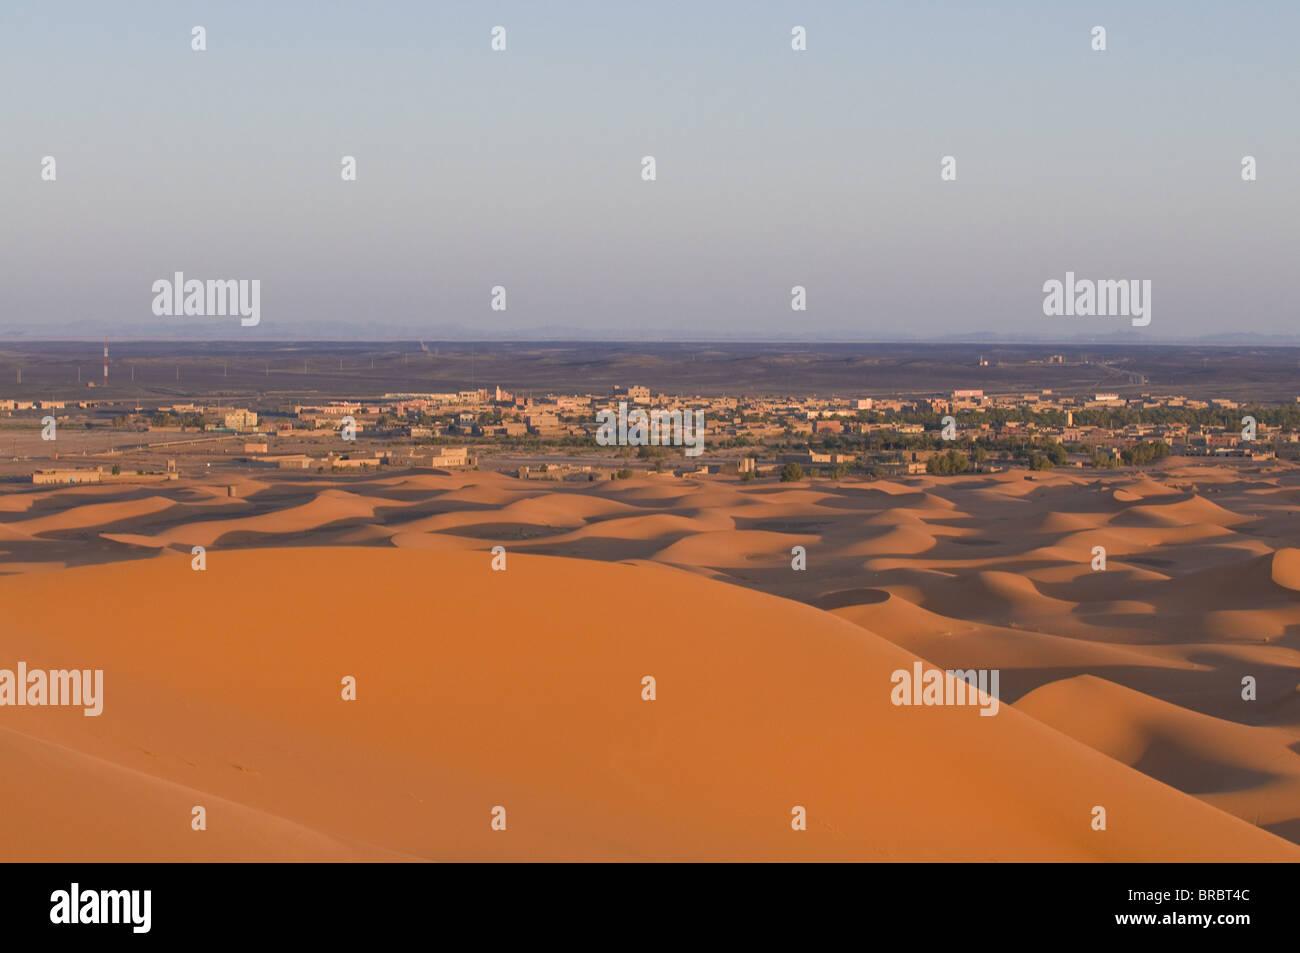 Sand dunes near Merzouga, Morocco, North Africa - Stock Image